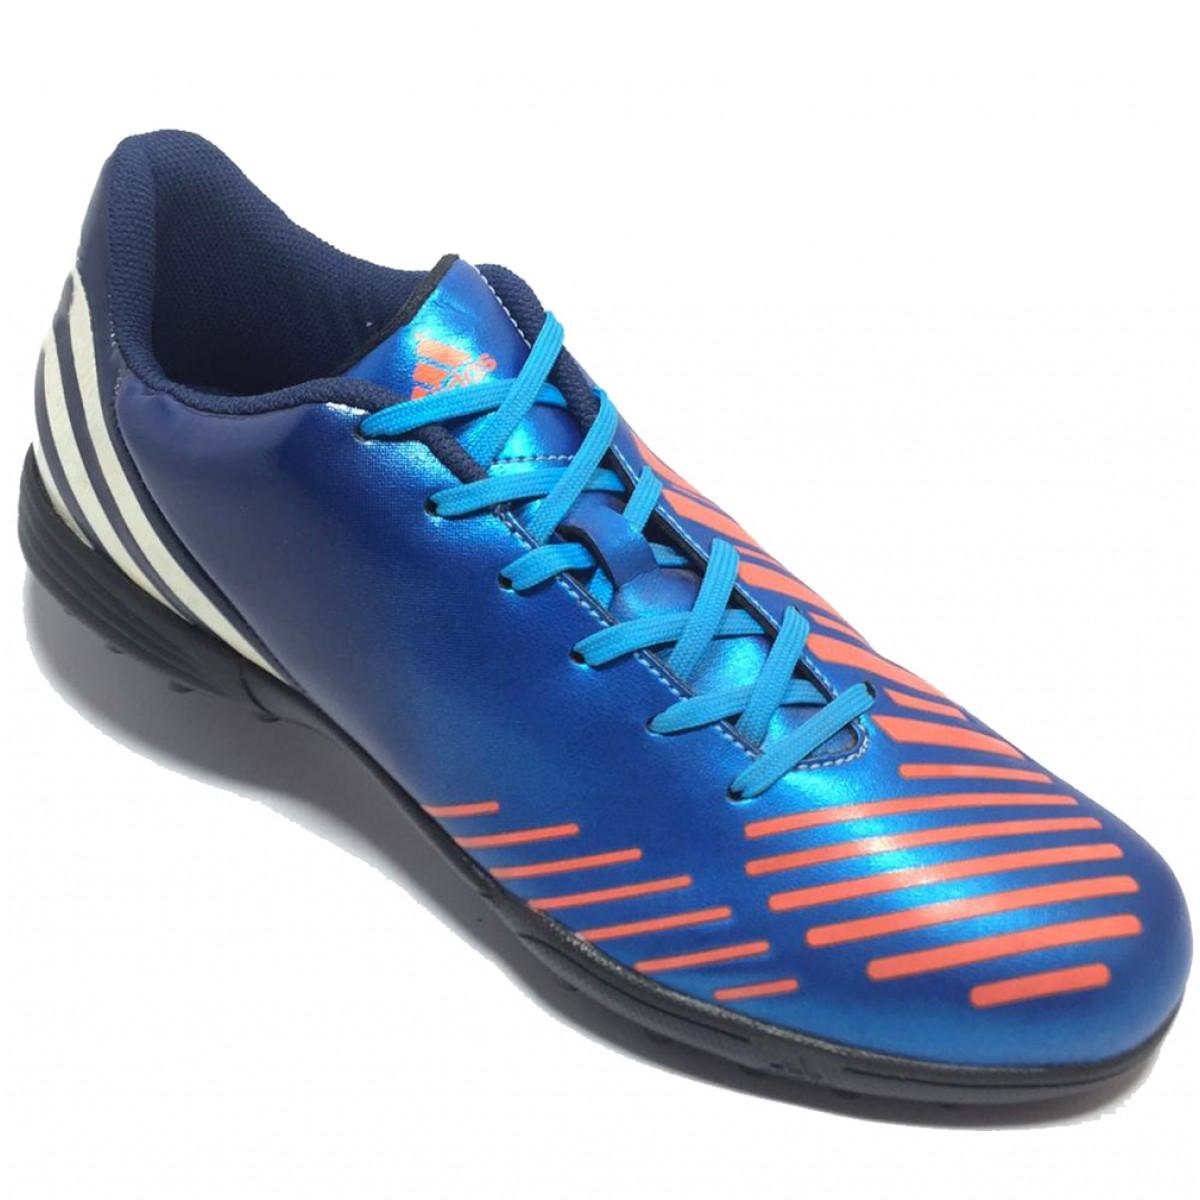 24bf3869d Chuteira Society Adidas Predito LZ TRX TF Azul e Laranja - Compre ...